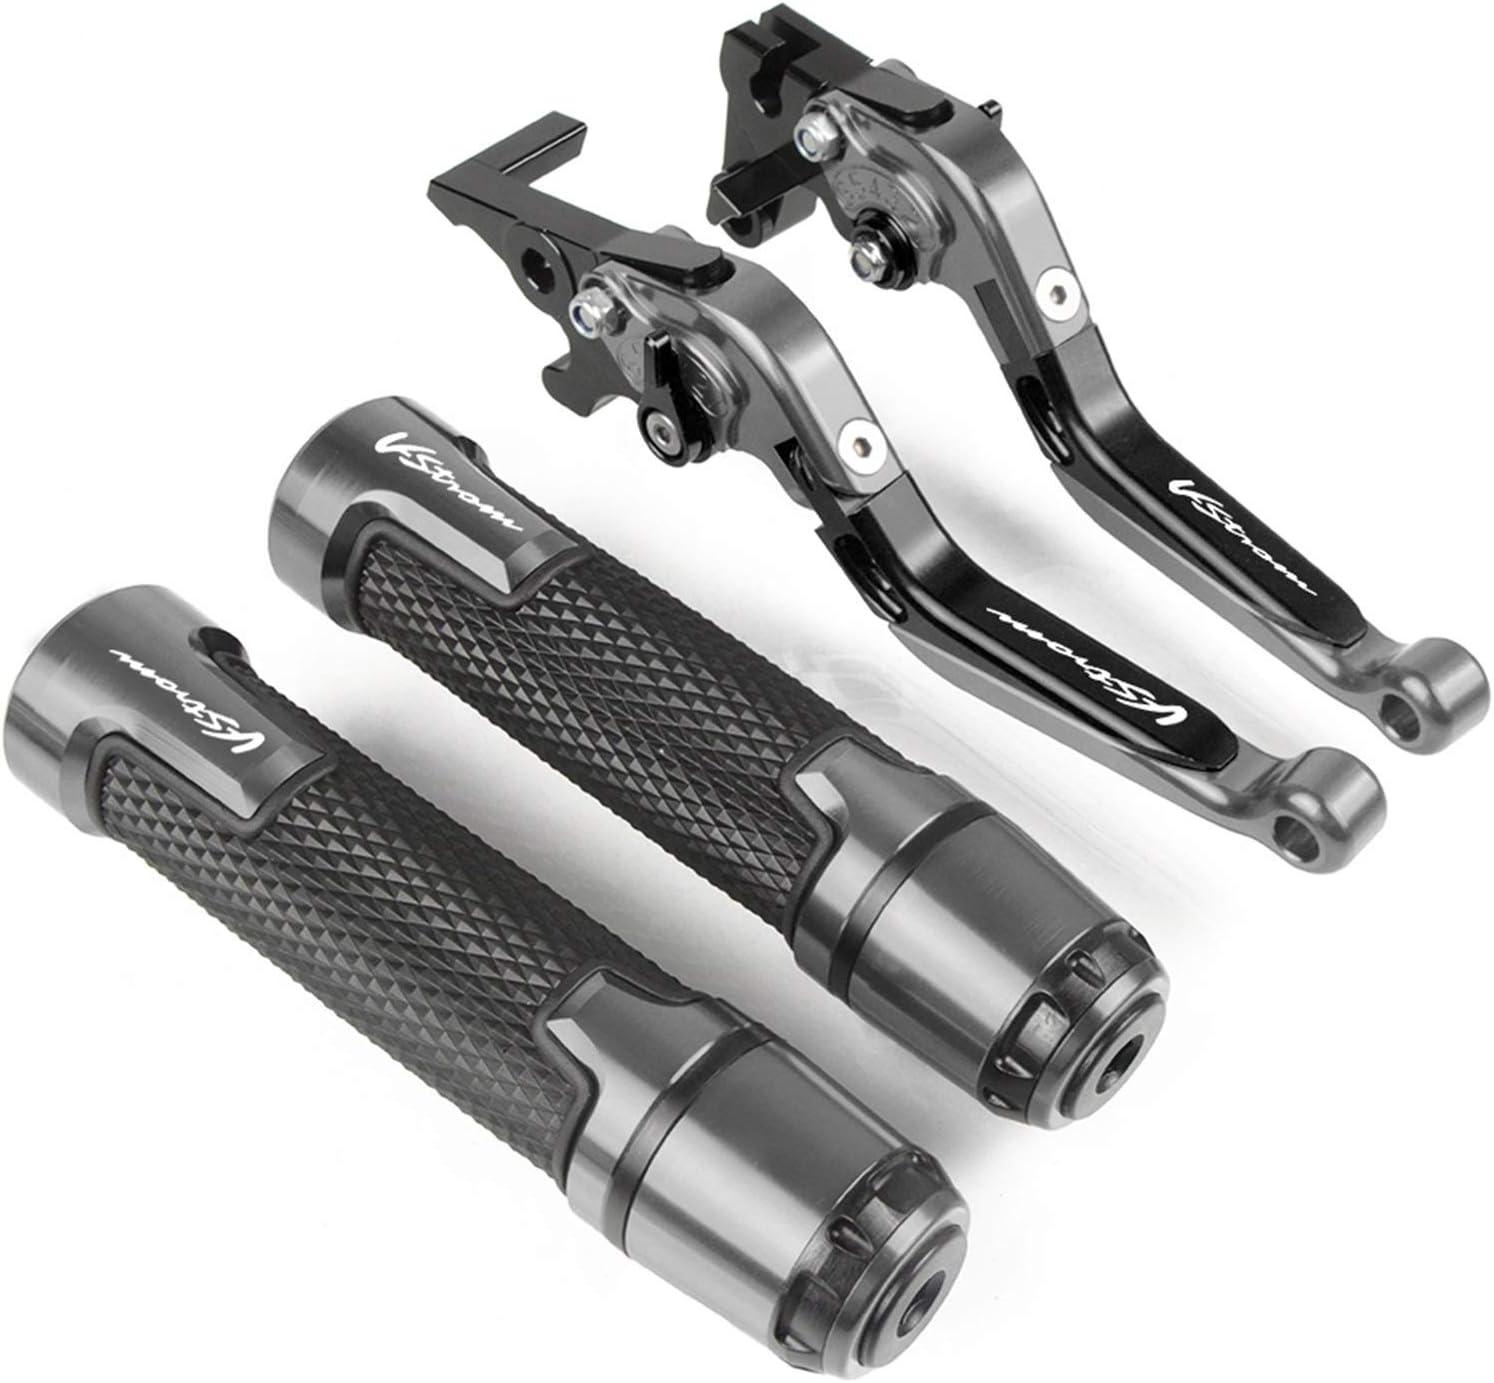 Free shipping / New Motorcycle Clutch Bombing new work Grip Set For Suzuki 250 DL250 V-strom V-str DL